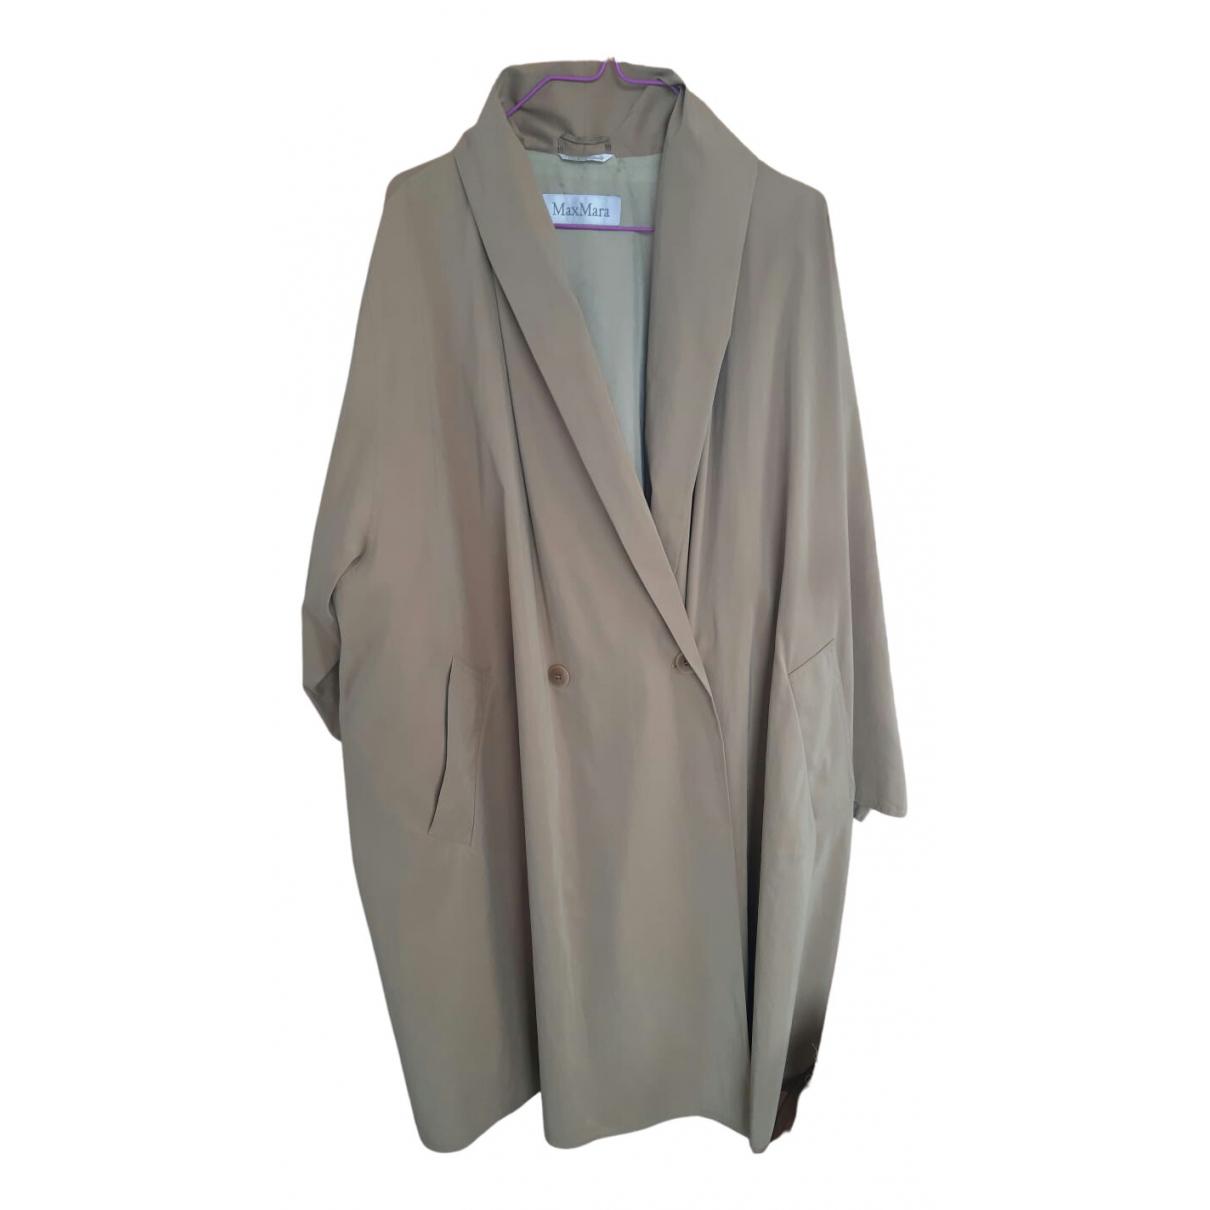 Max Mara \N Beige Trench coat for Women 42 IT